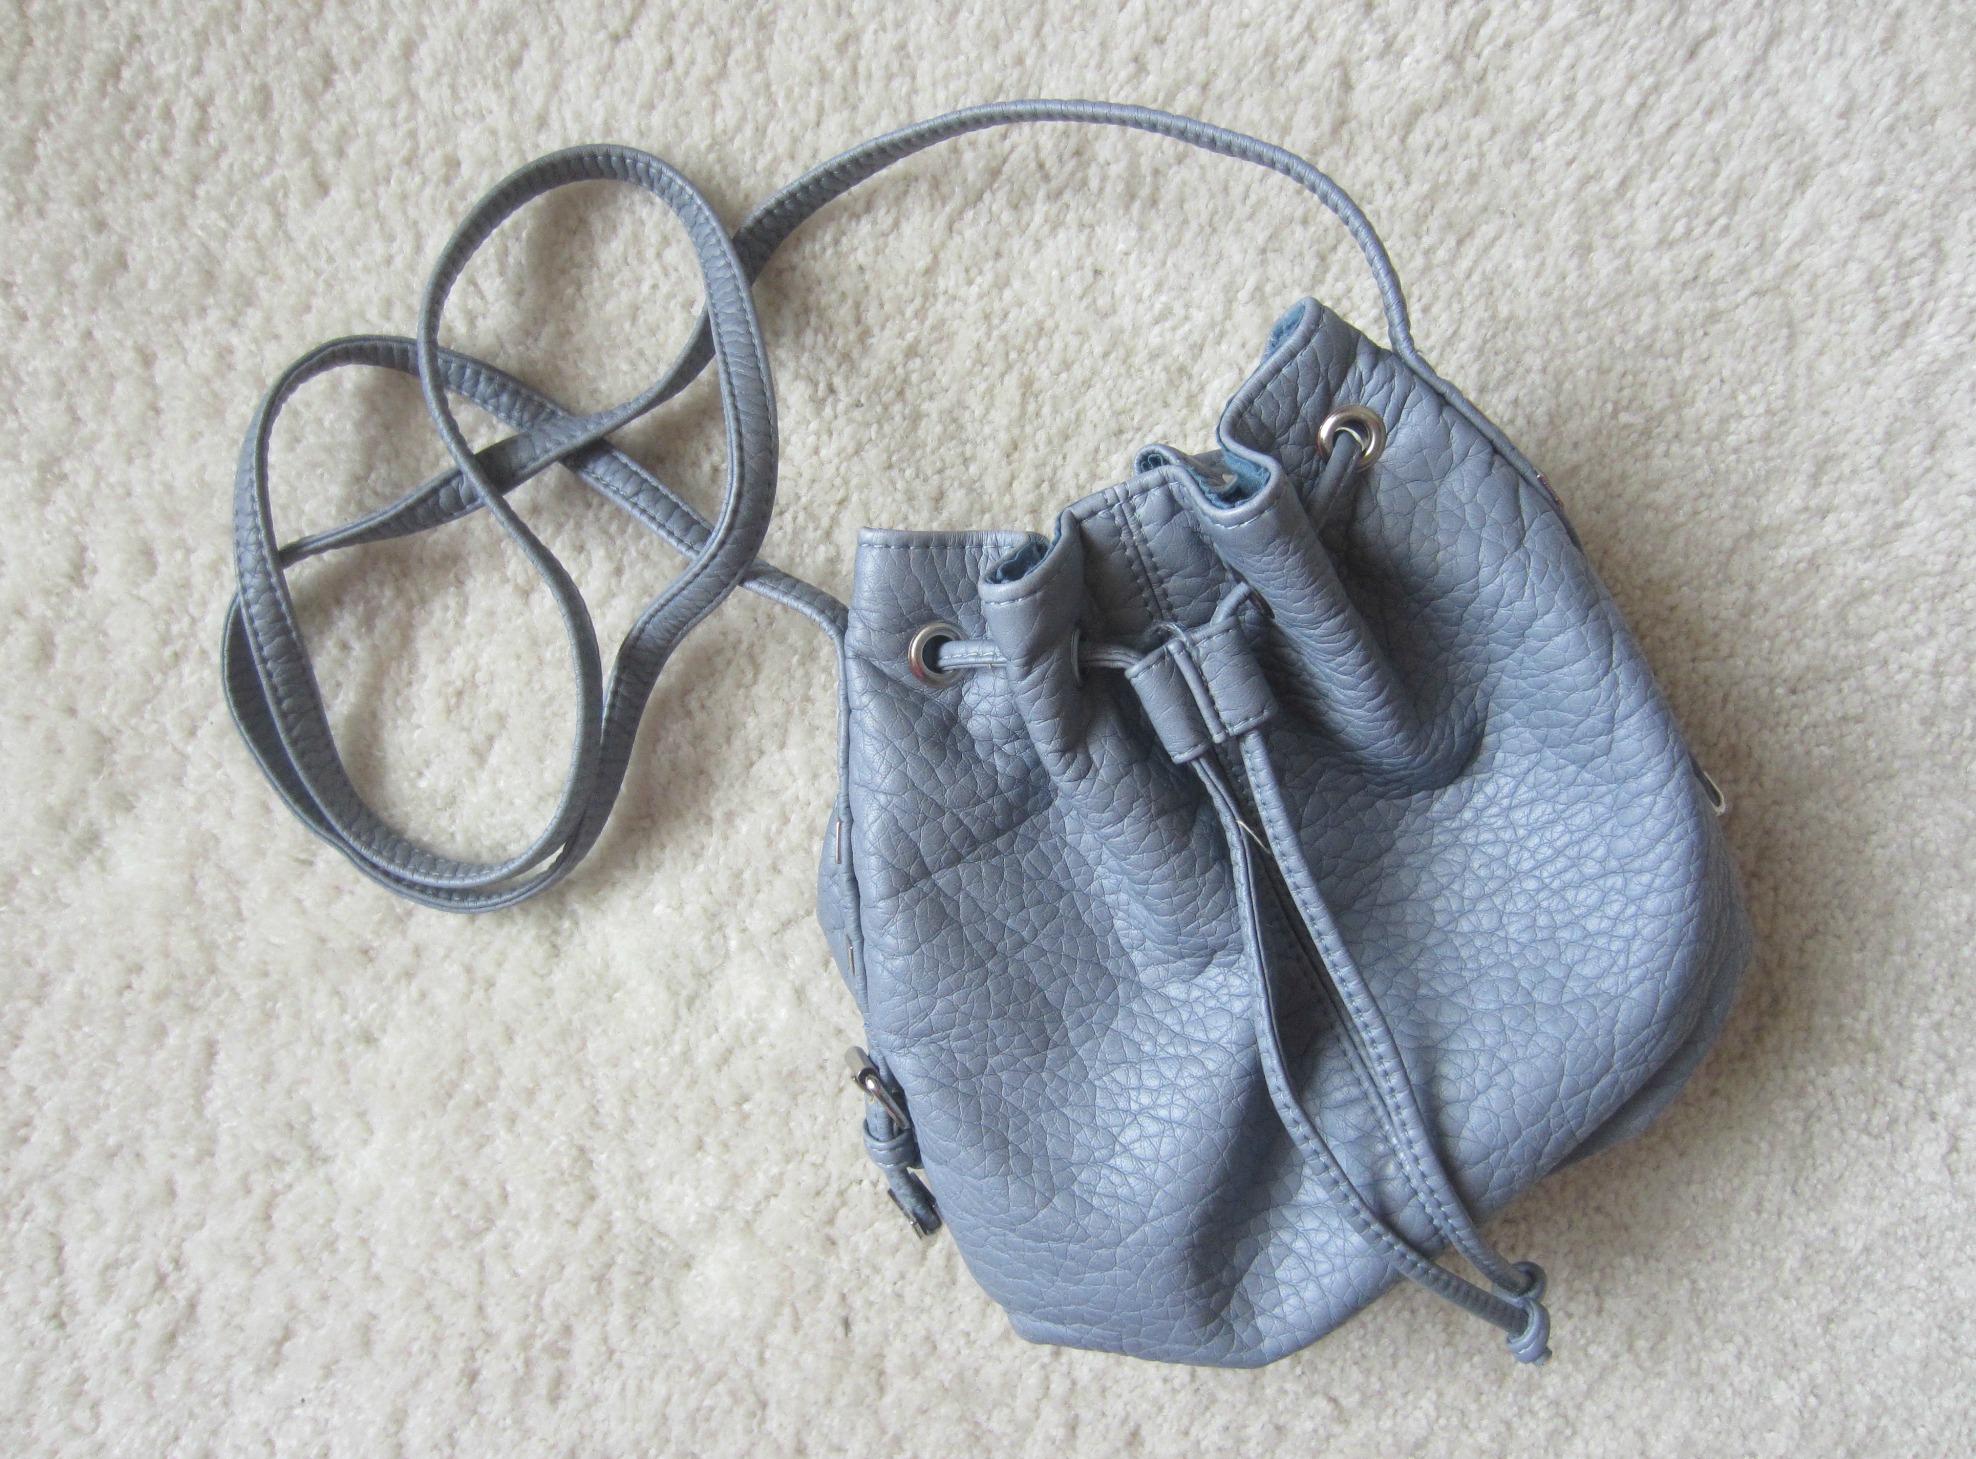 candies crossover purse kohls